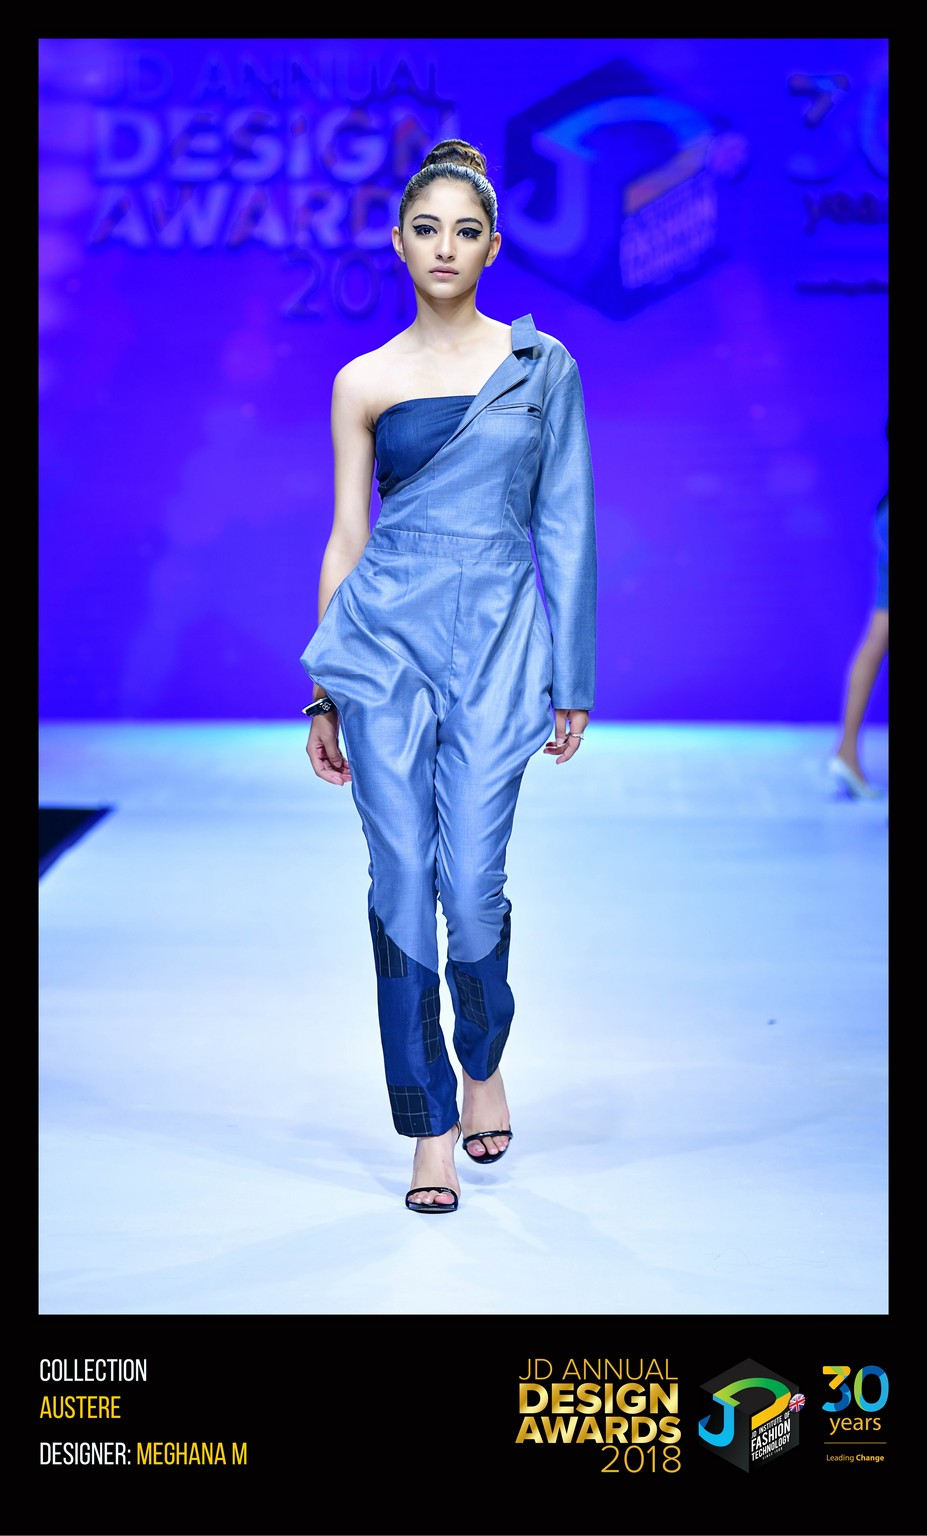 Austere – Change – JD Annual Design Awards 2018   Designer: Meghana   Photography : Jerin Nath (@jerin_nath) austere - AUSTERE5 - Austere – Change – JD Annual Design Awards 2018